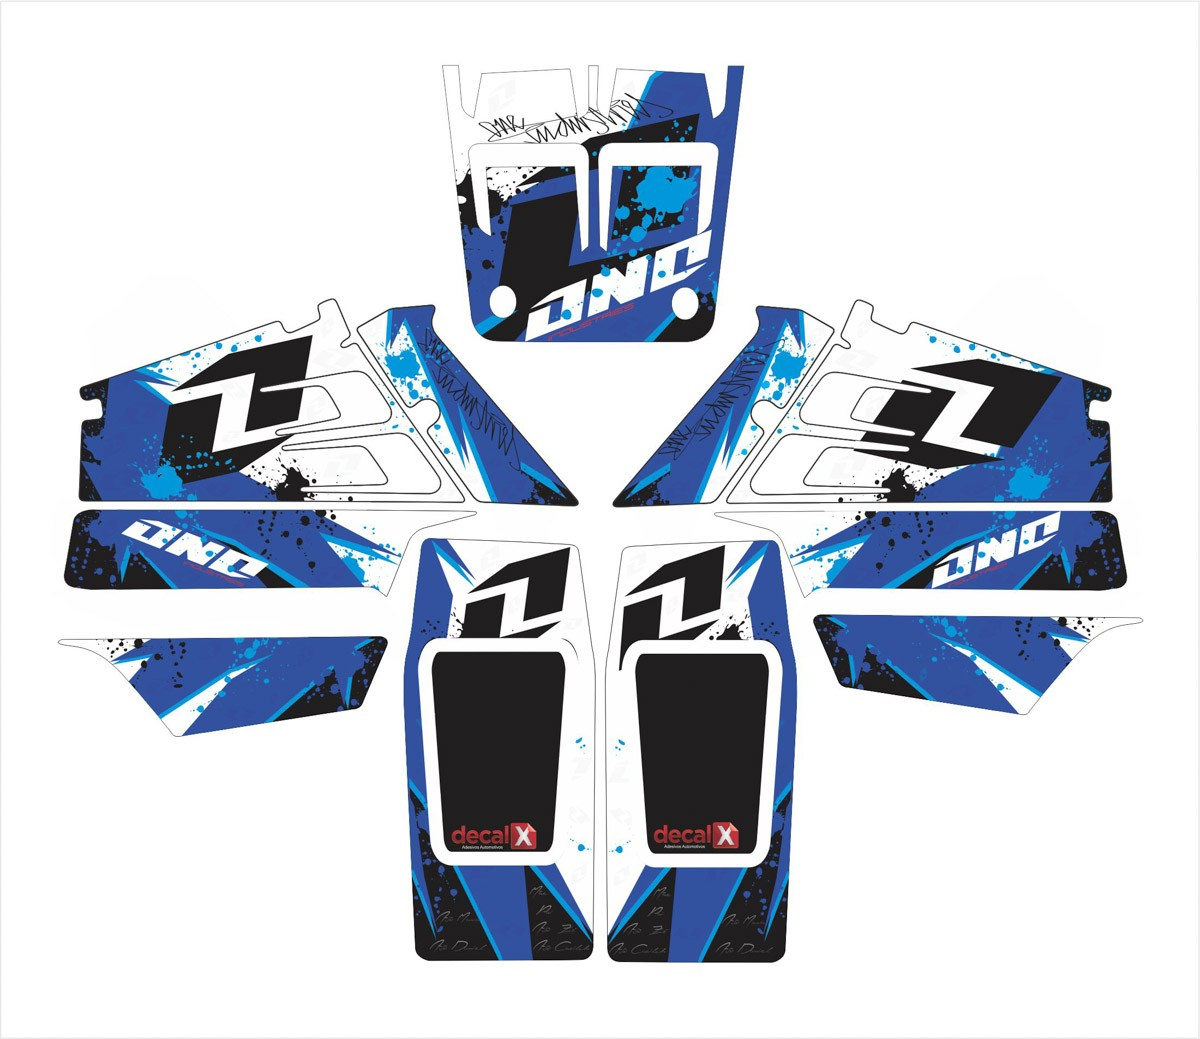 Kit Adesivos Quadriciclo Yamaha Banshee Yh005